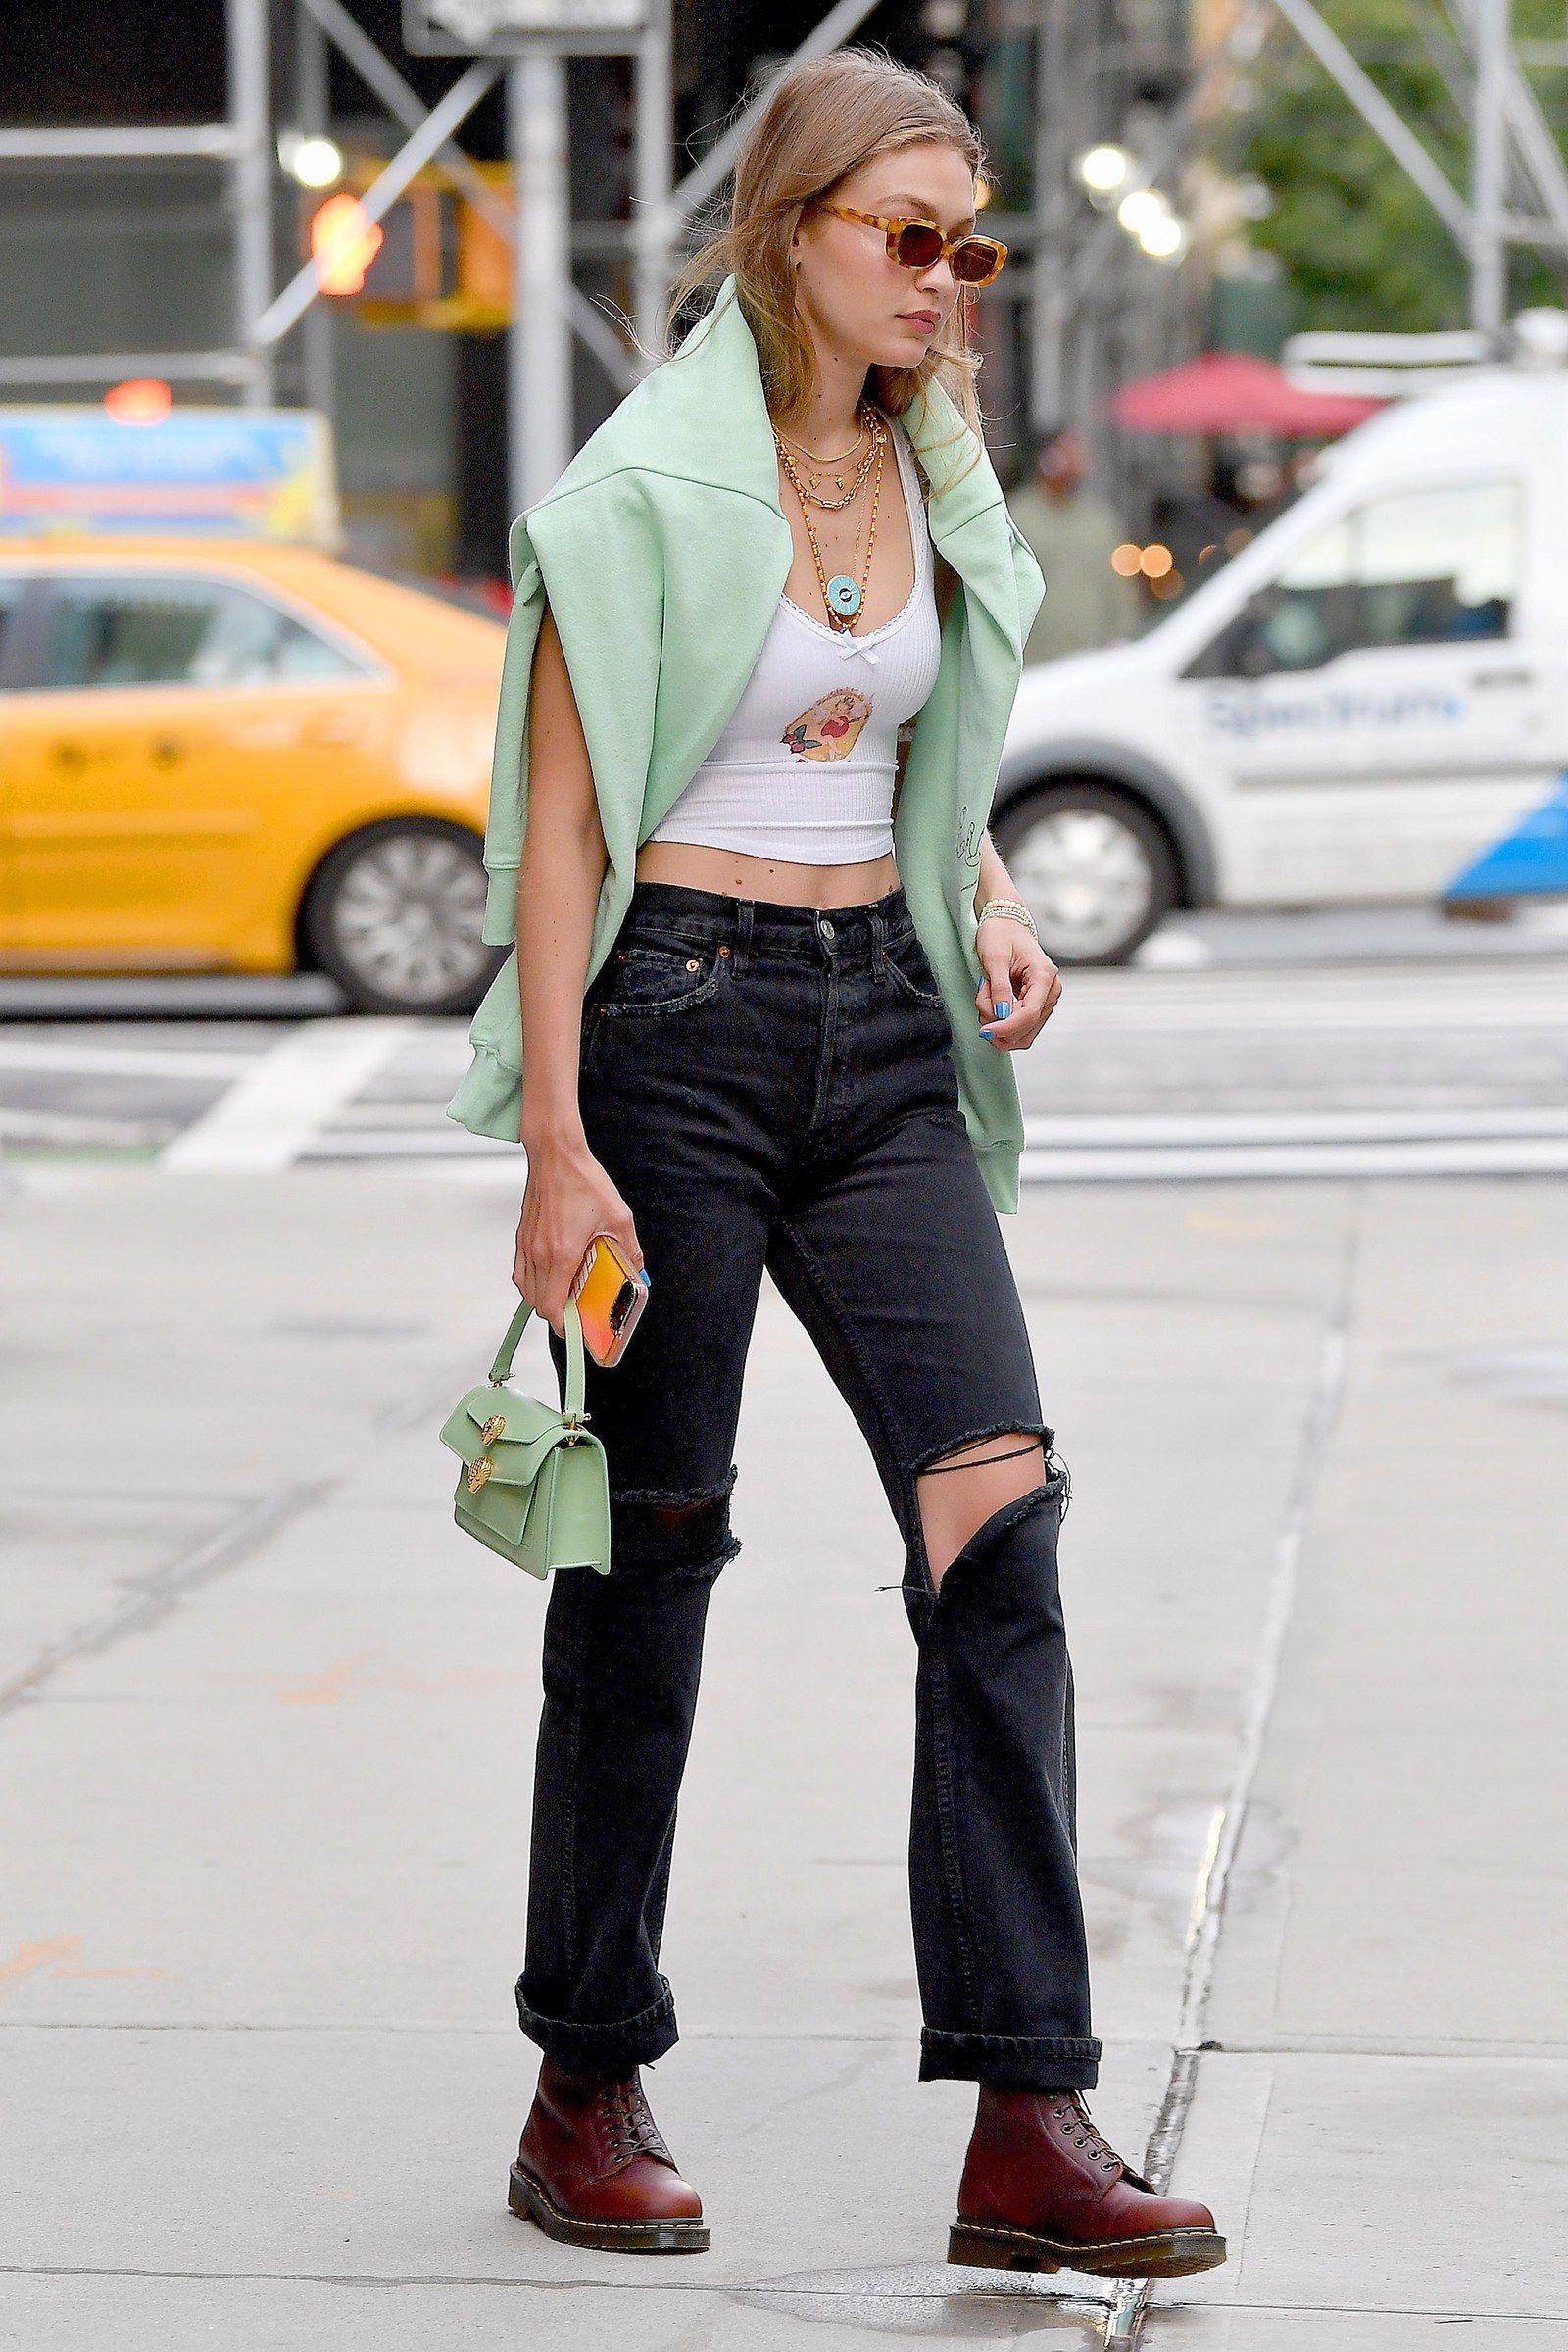 Gigi Hadid Gives Alexander Wang's Bvlgari Collection Its Street Style Debut